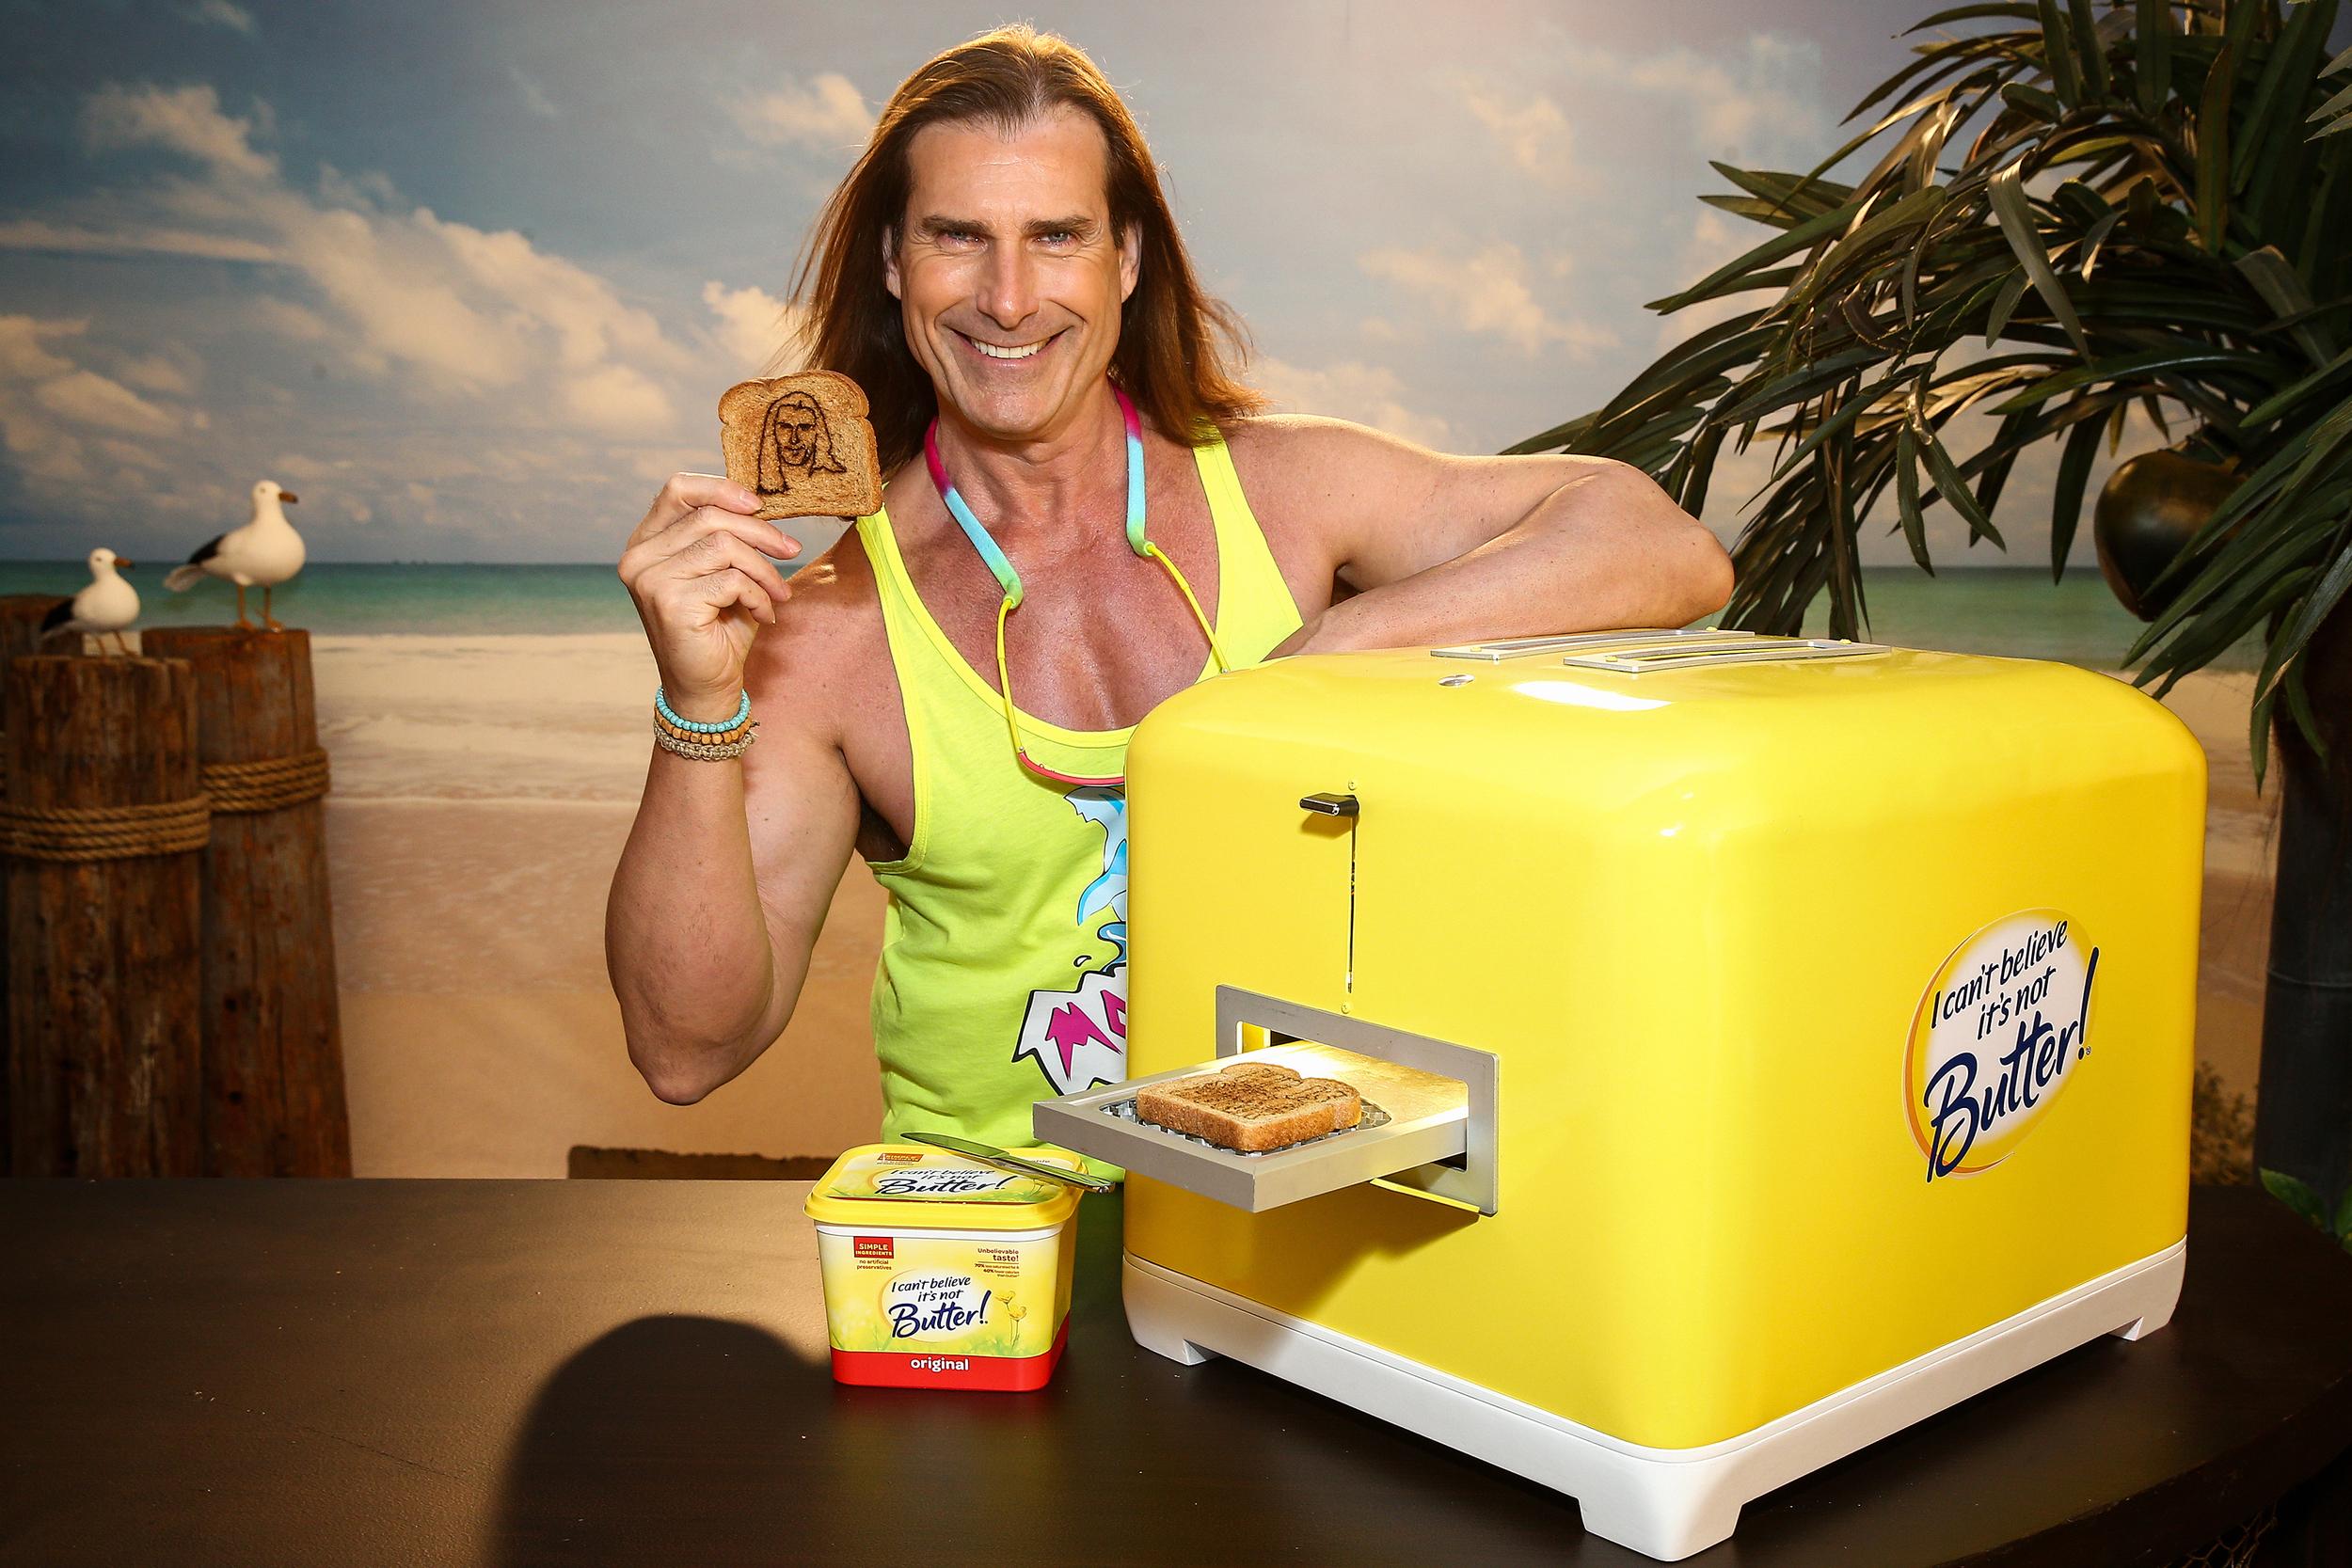 Fabio and toaster.jpg